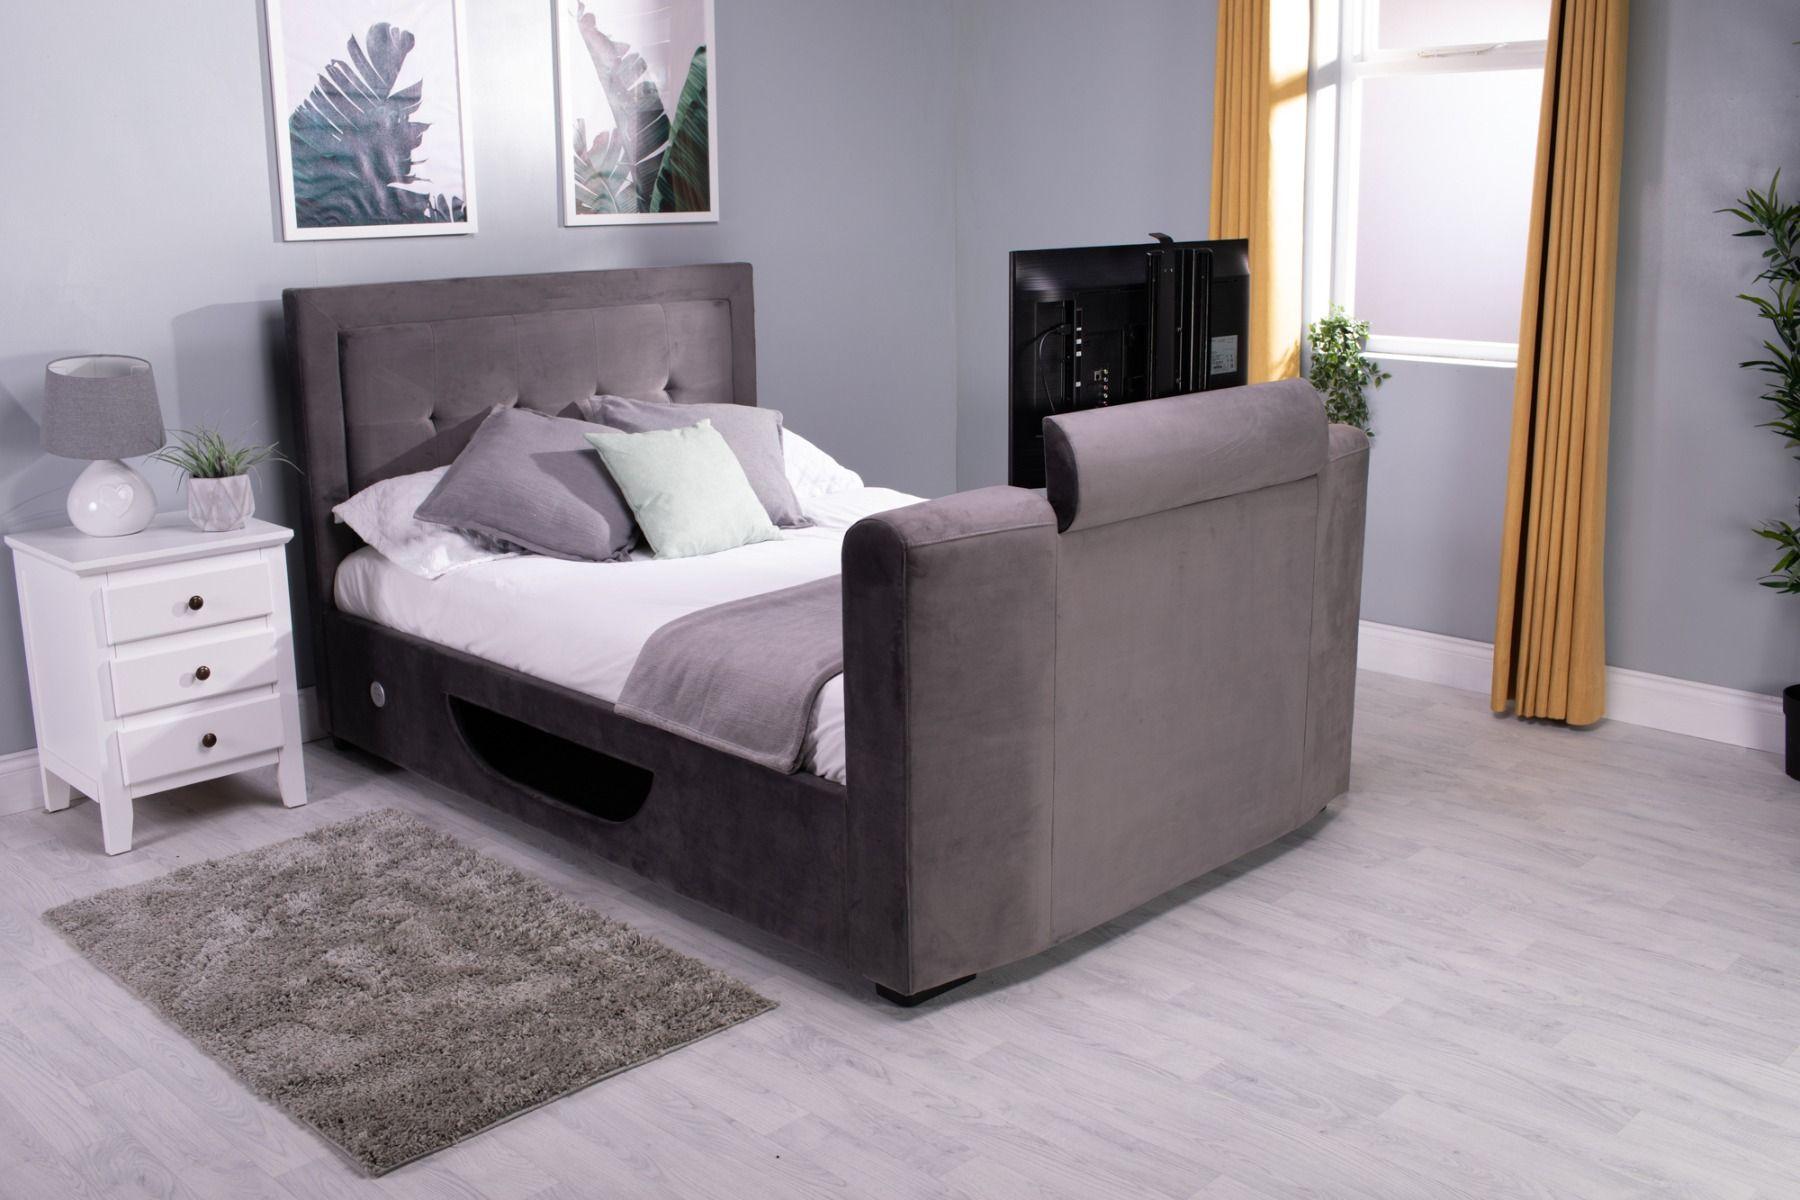 flair furnishings juliet side lift